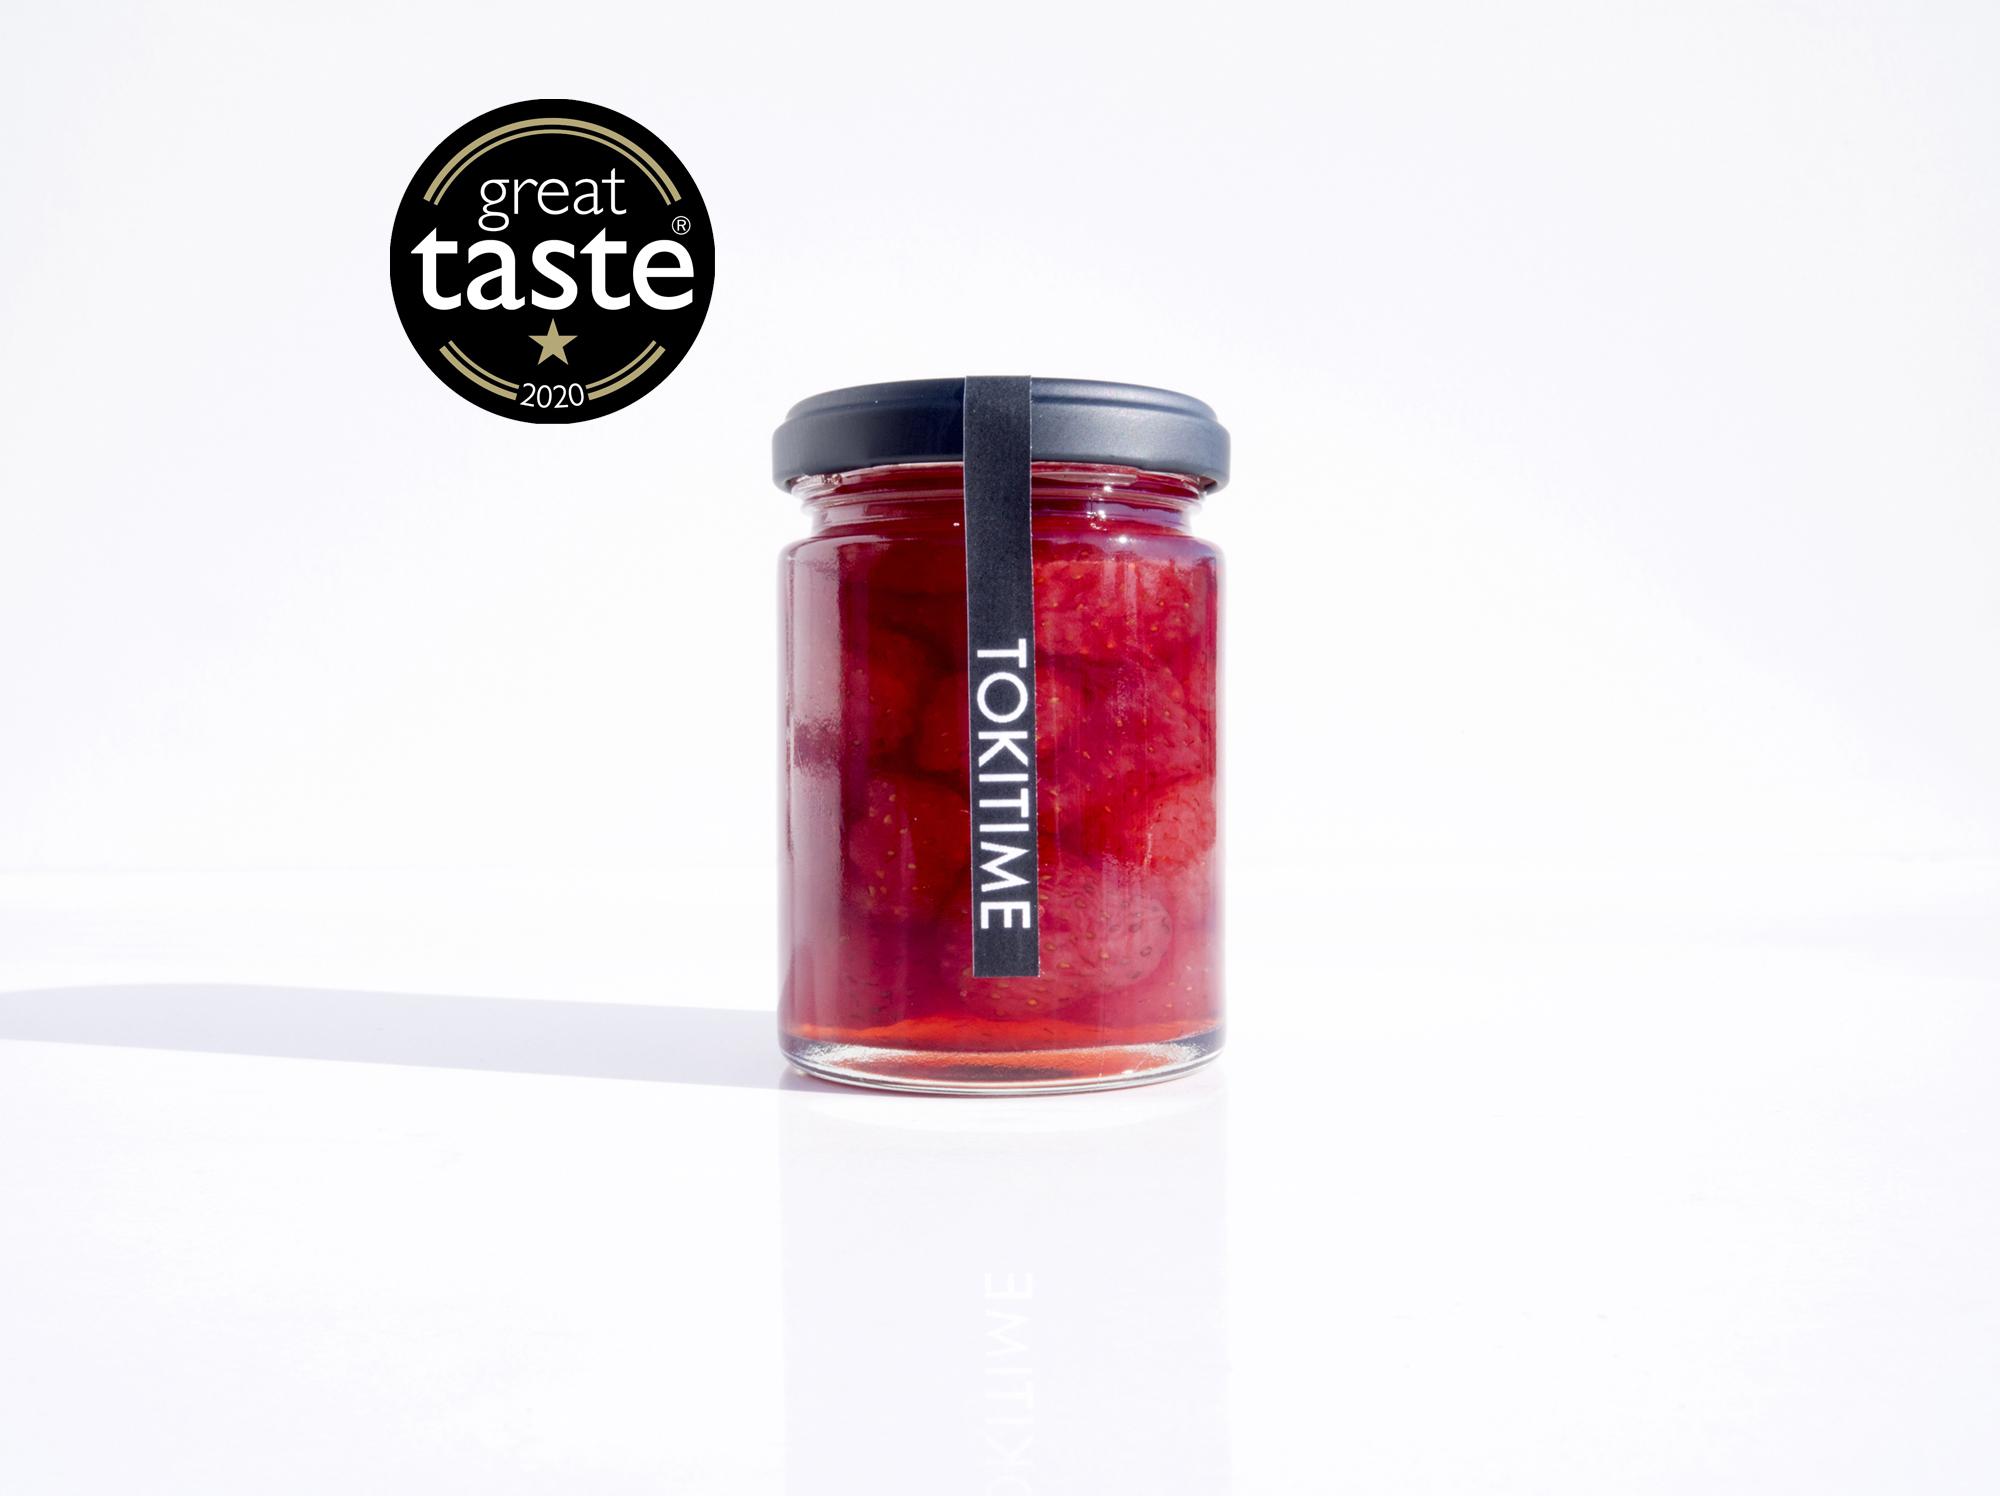 ICHIGO いちごジャム が 食のオスカー Great Taste Awards 2020 を受賞